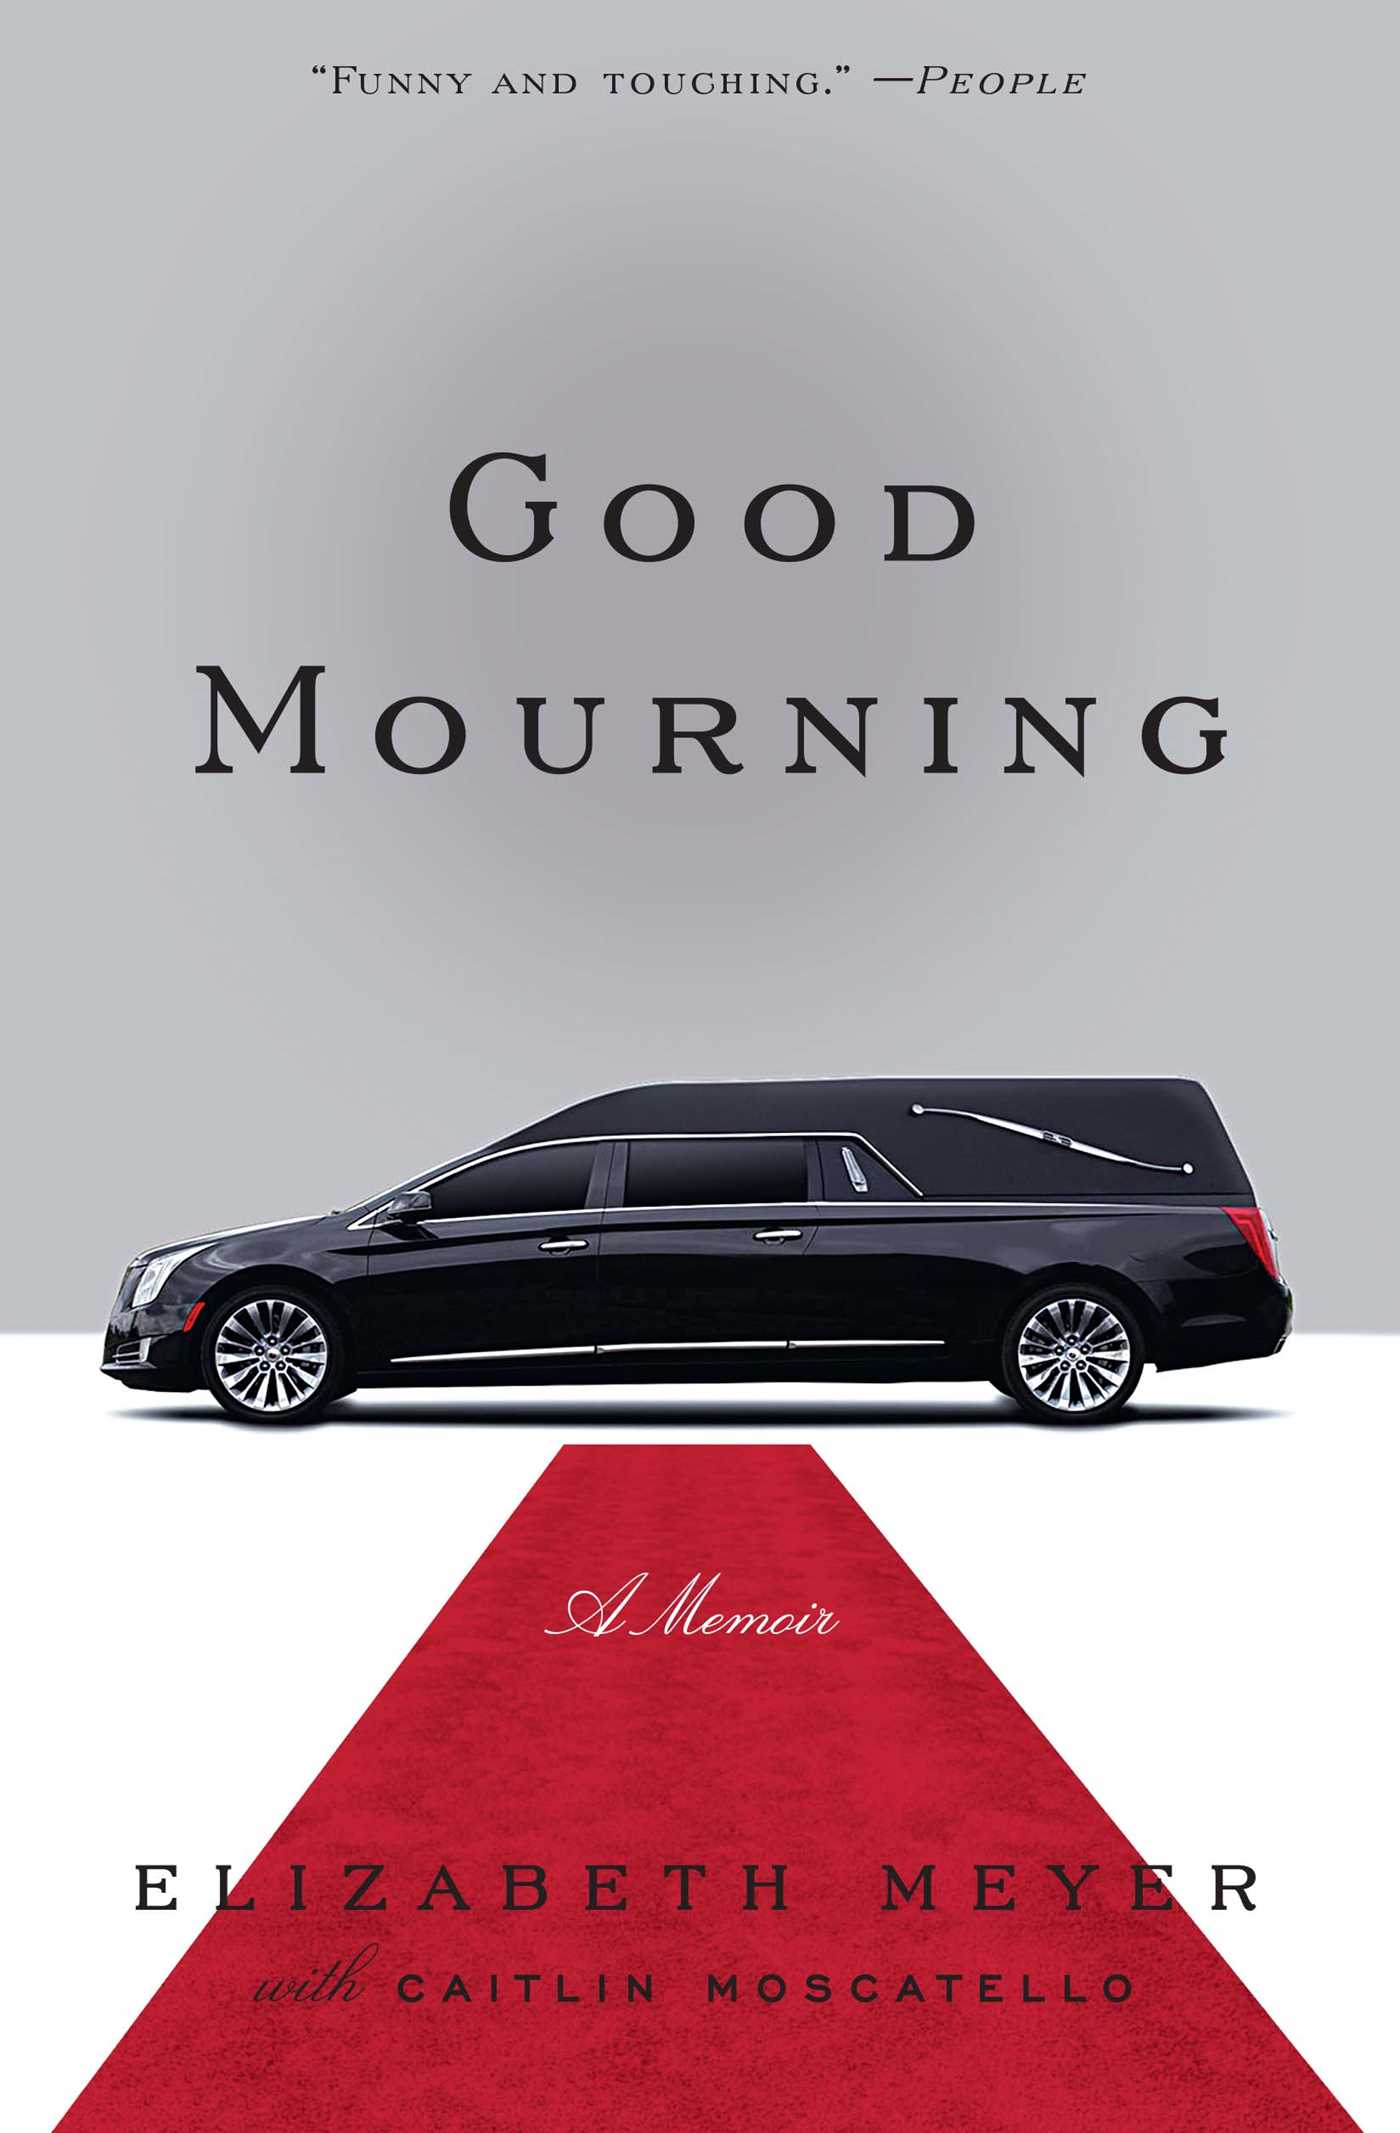 Good mourning 9781476783659 hr